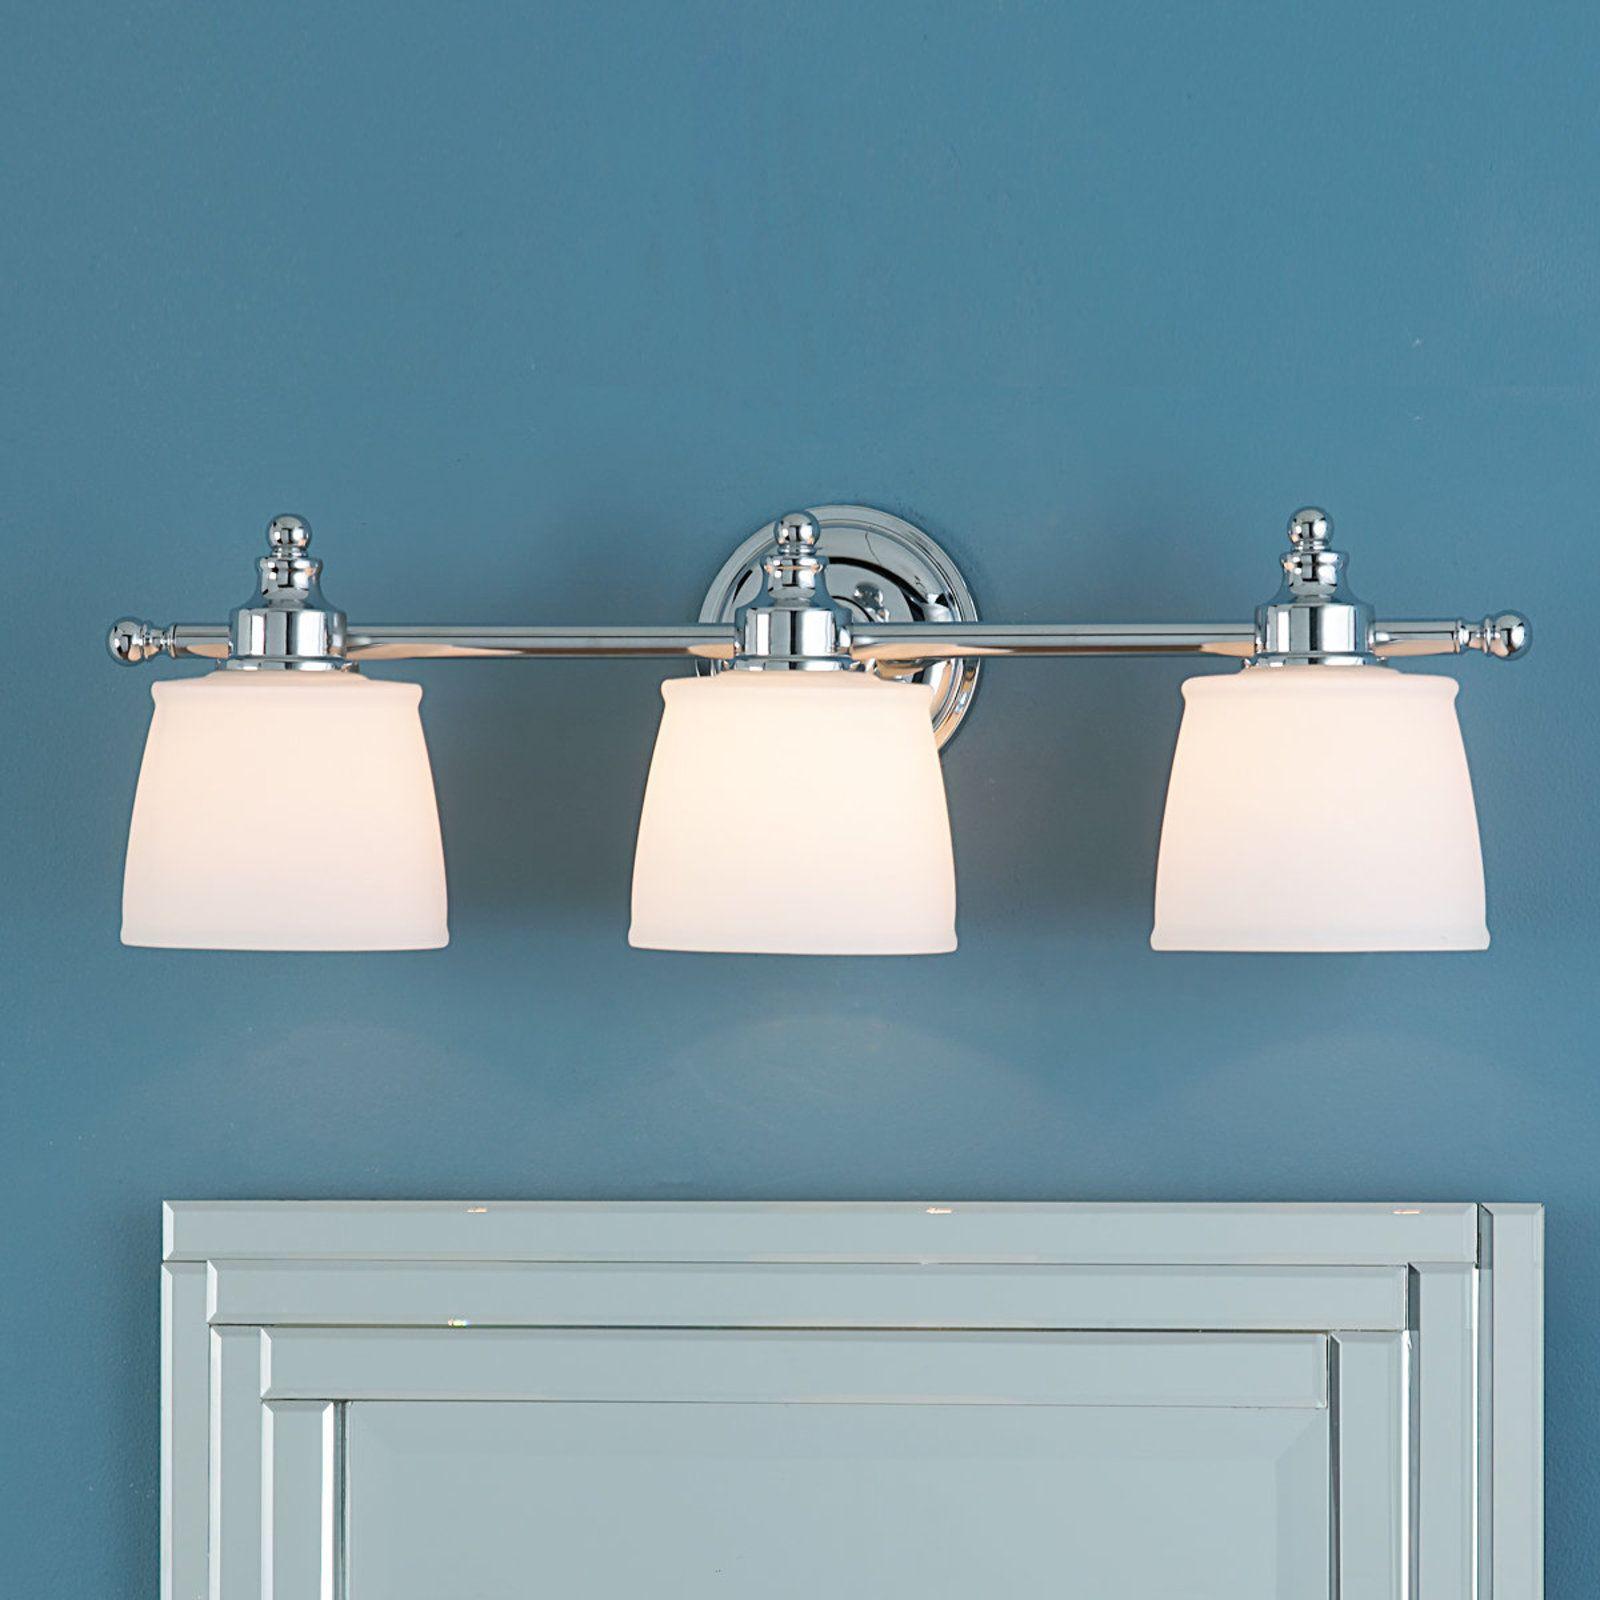 ByGone Classic Bath Light - 3 light | Classic baths, Bath light and ...